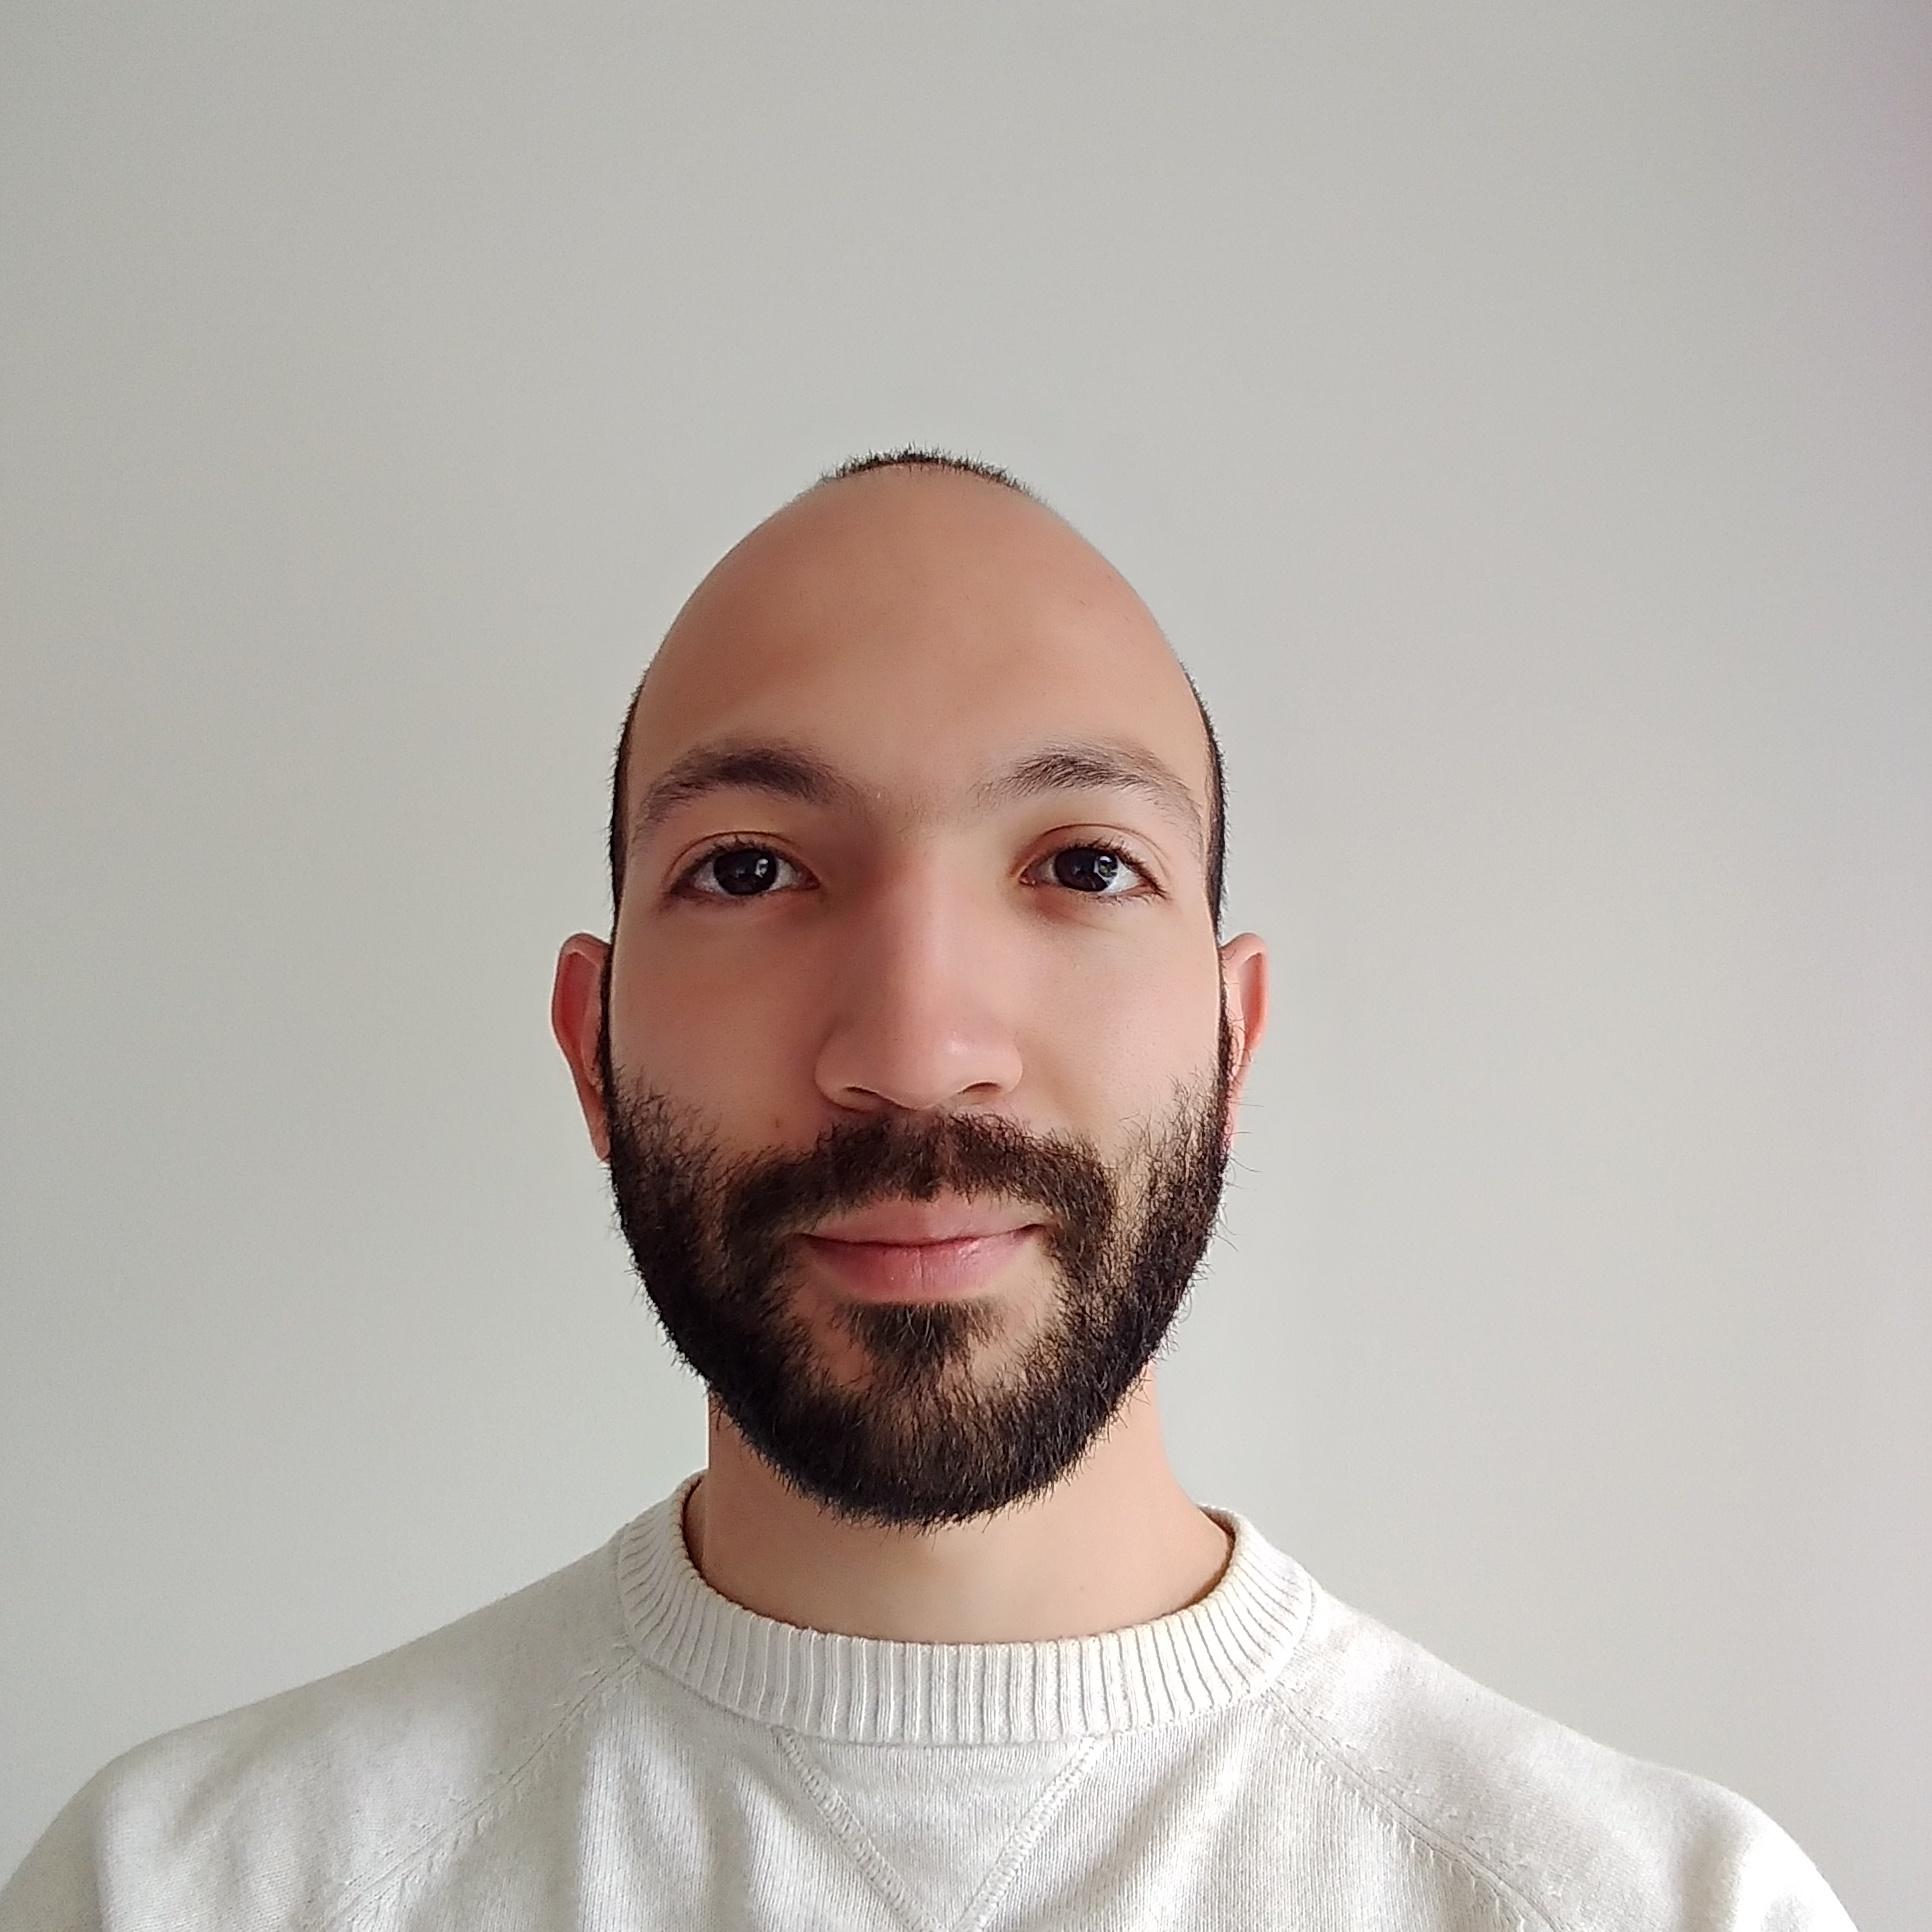 Andres Salazar Fillippo